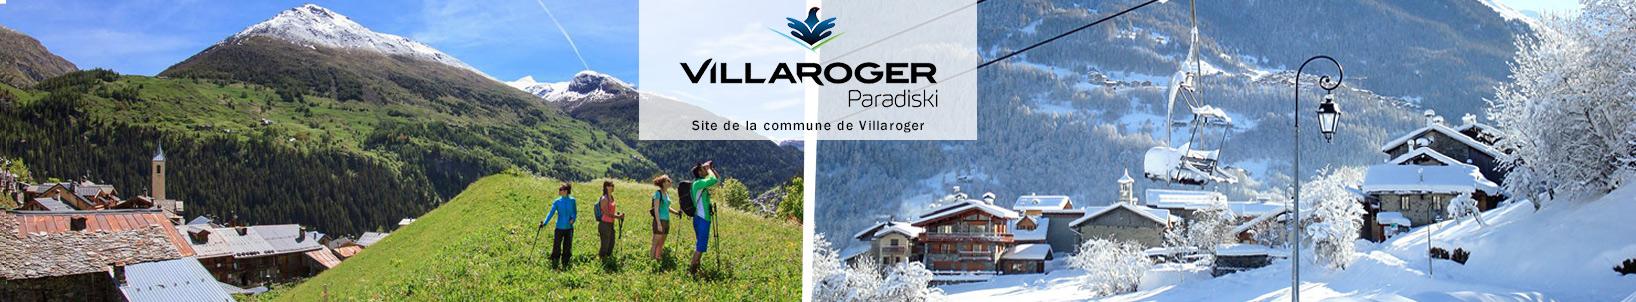 Commune de Villaroger